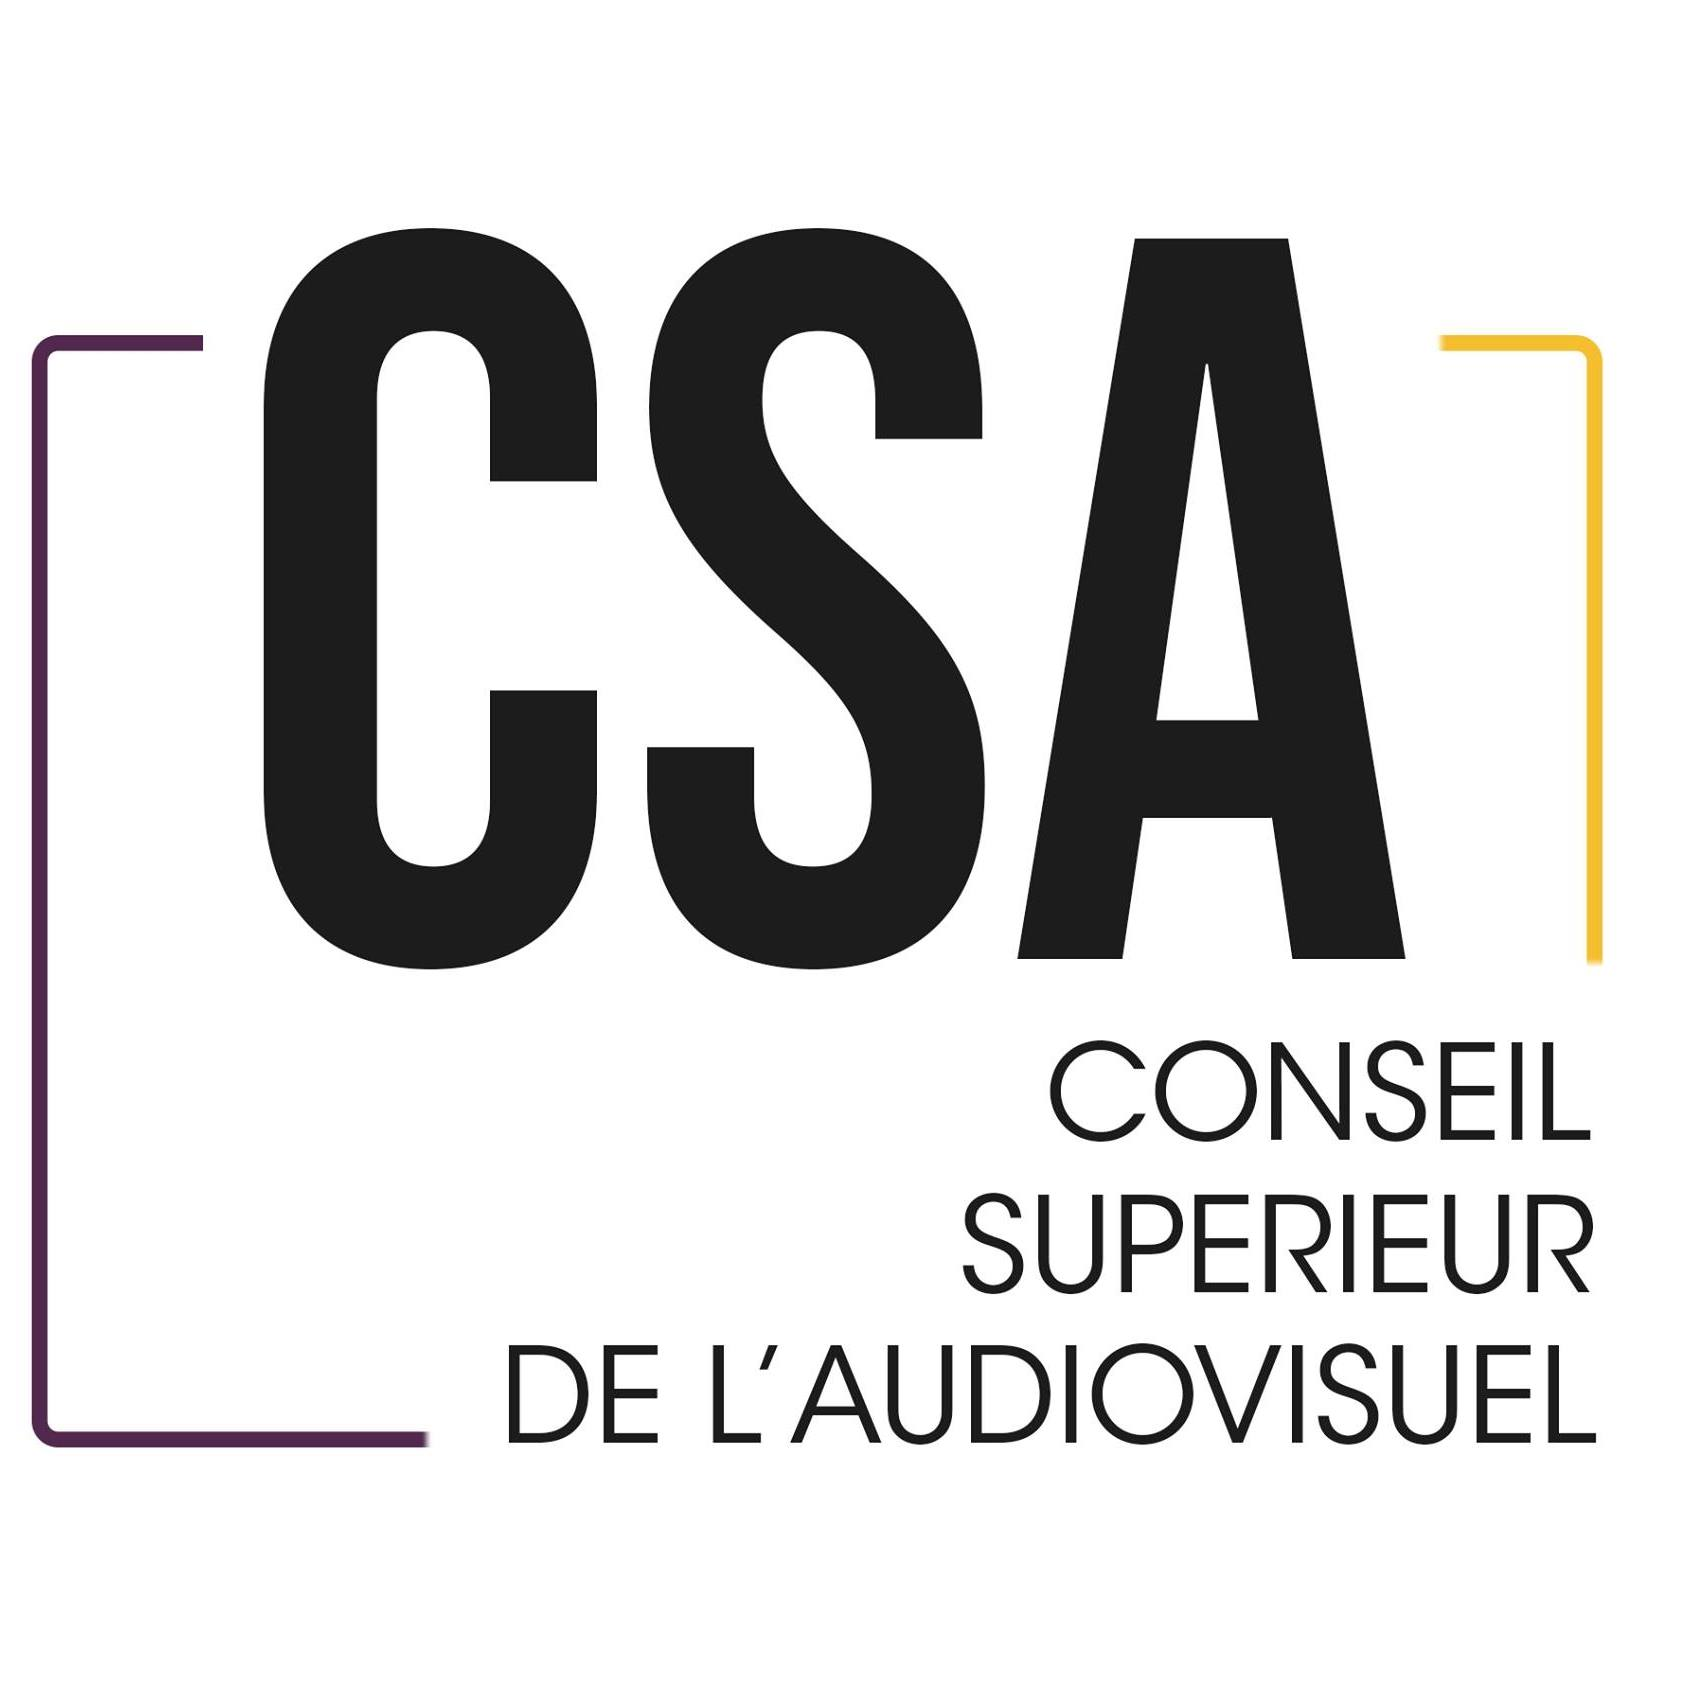 Covid-19 : de nombreuses radios locales devraient disparaitre en Europe